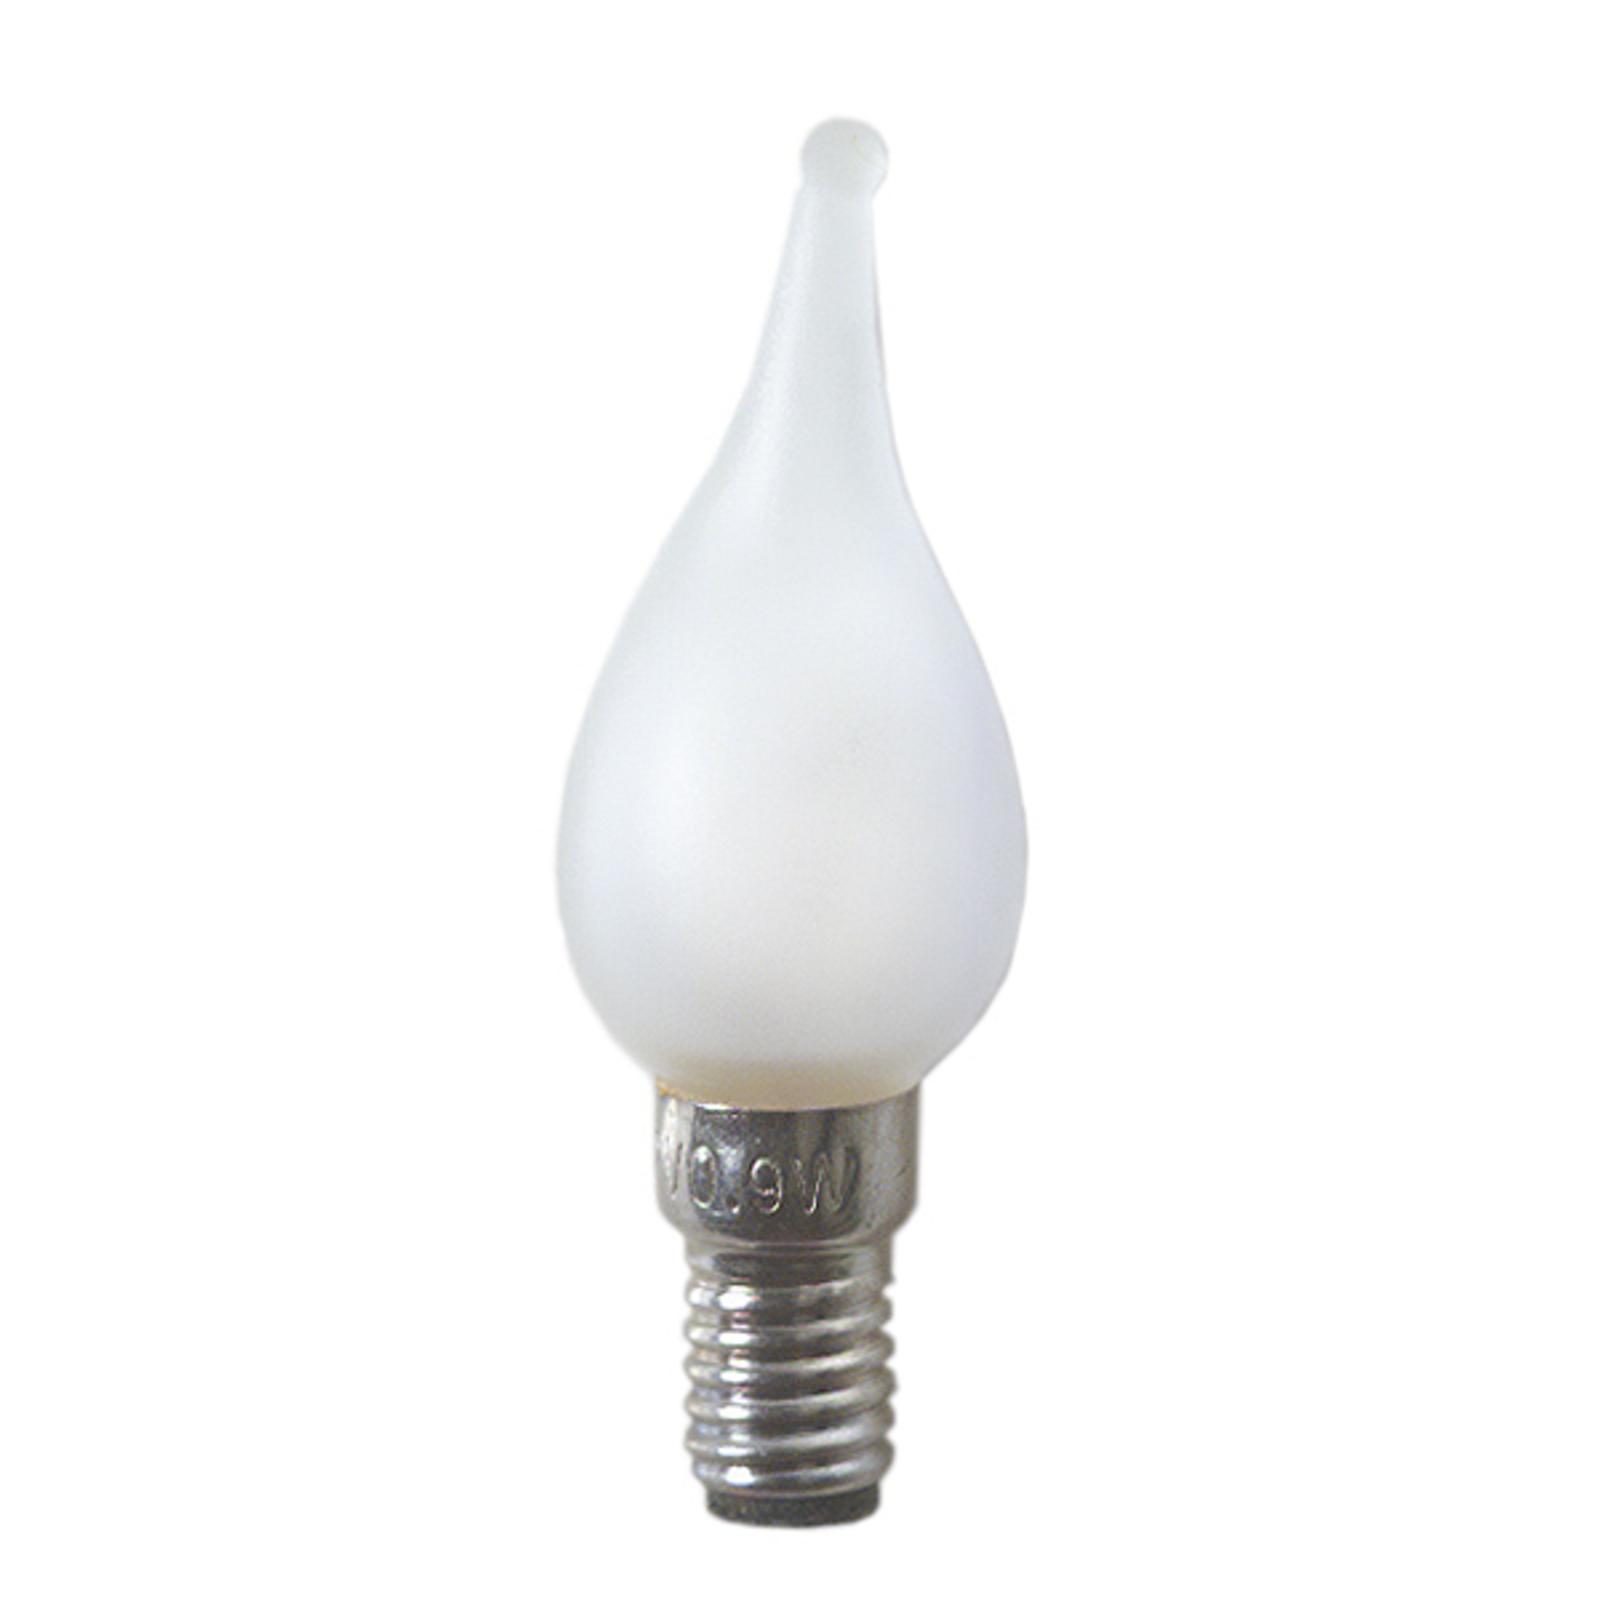 E6 0,9W 12V reservlampor NV-fönsterbelysning 3pack